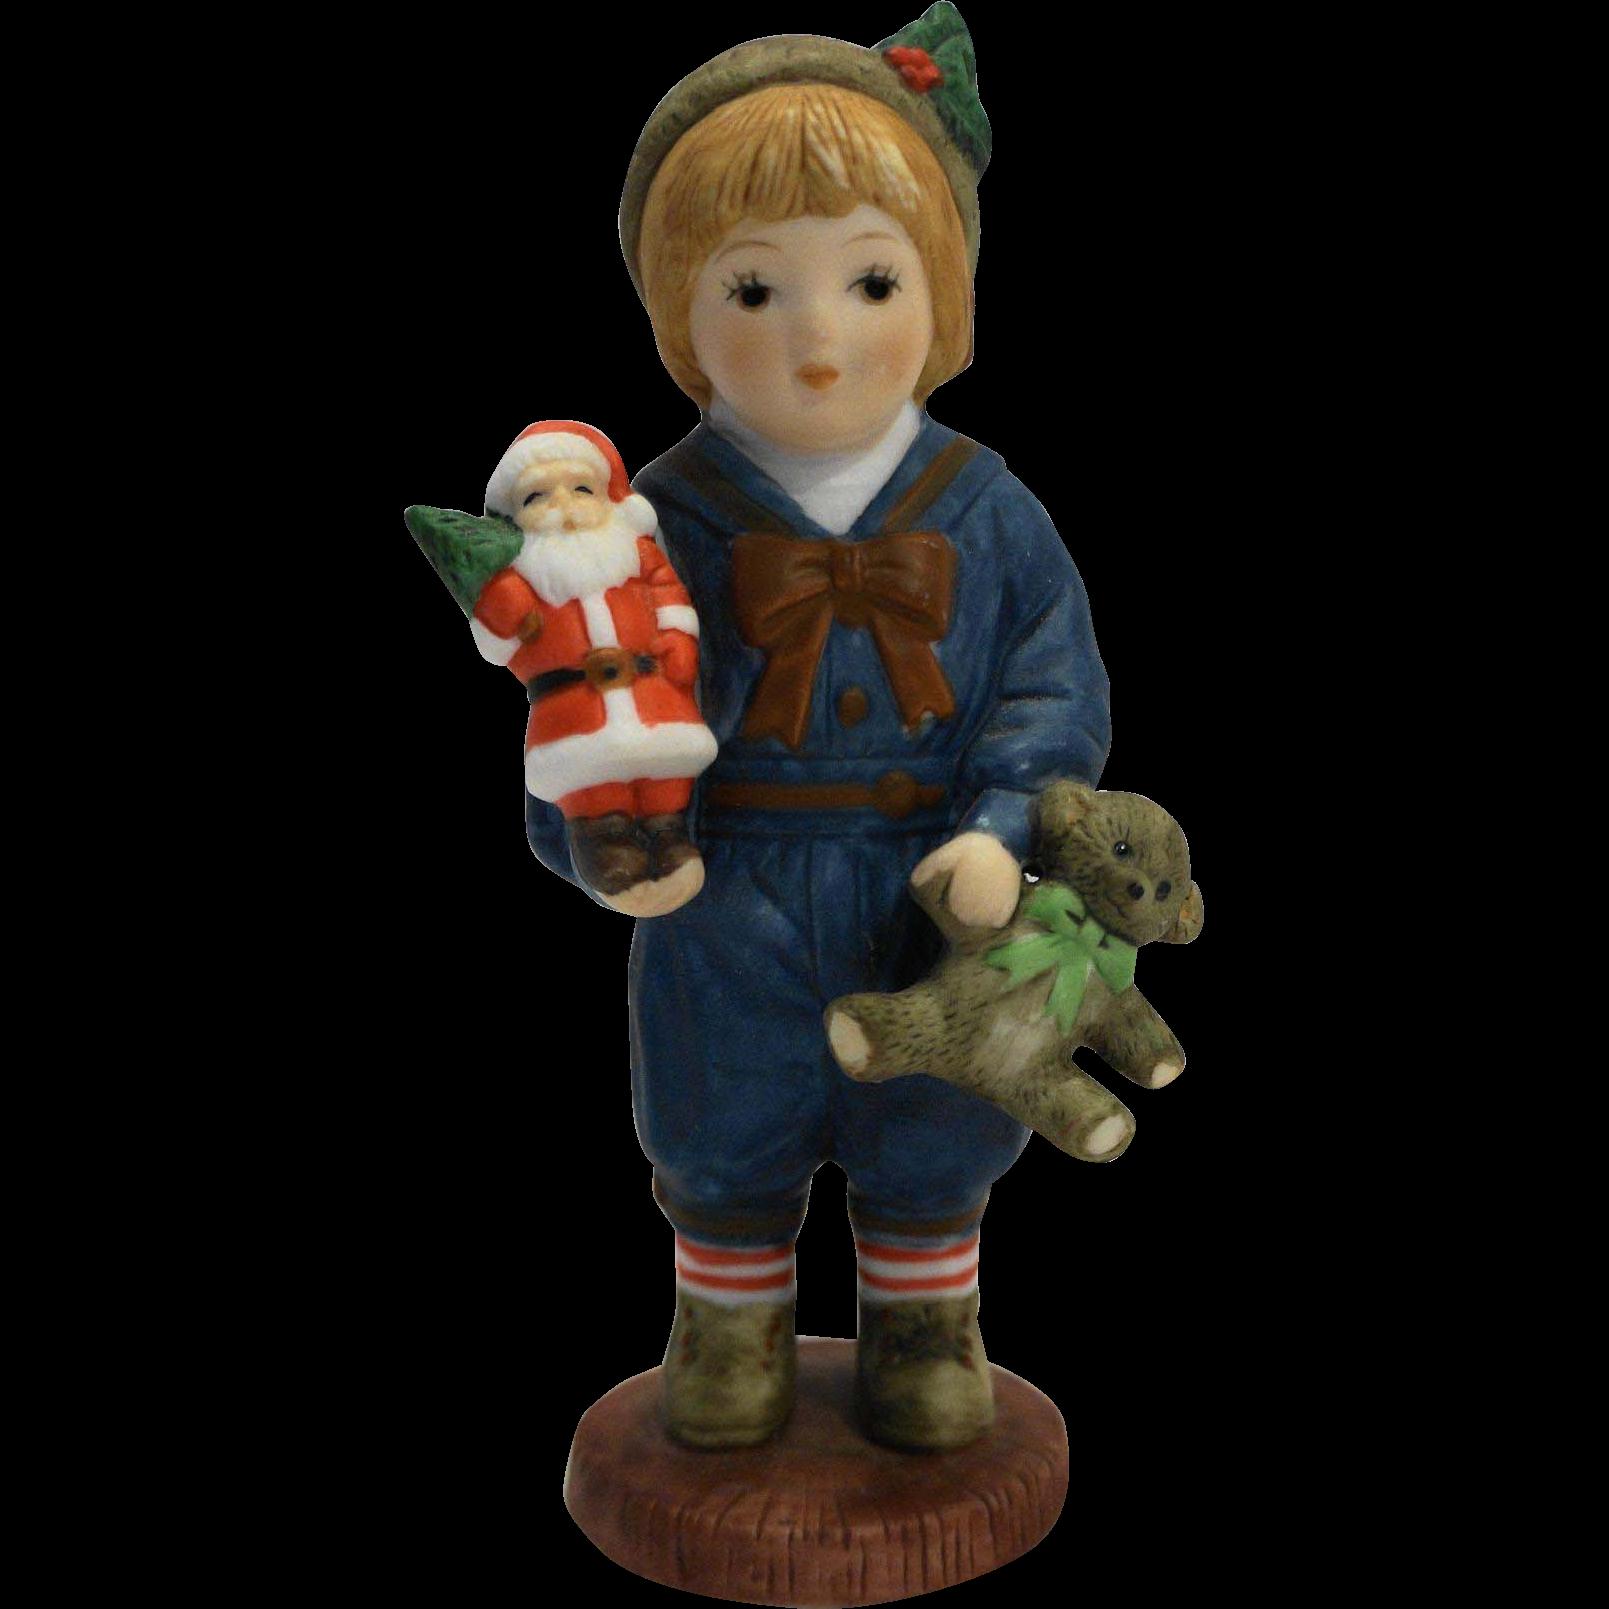 Georgi H3801 Christmas Giordano Figurine Hand Painted Porcelain